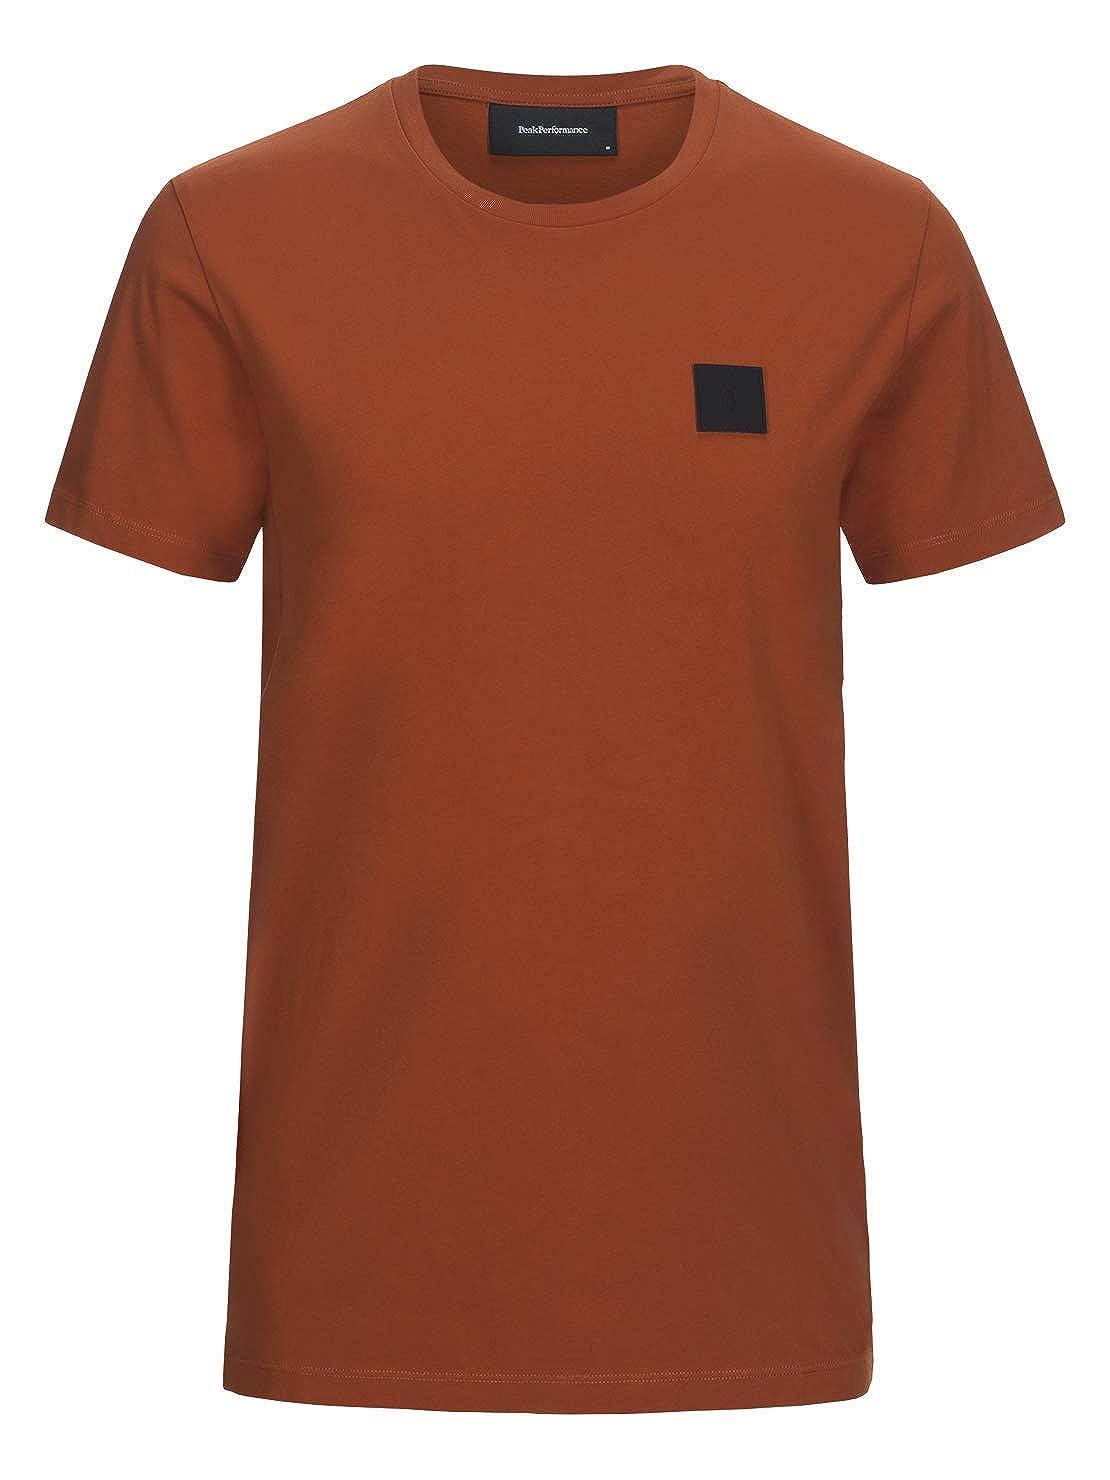 Peak Performance Herren original t-Shirt Funktionsshirt